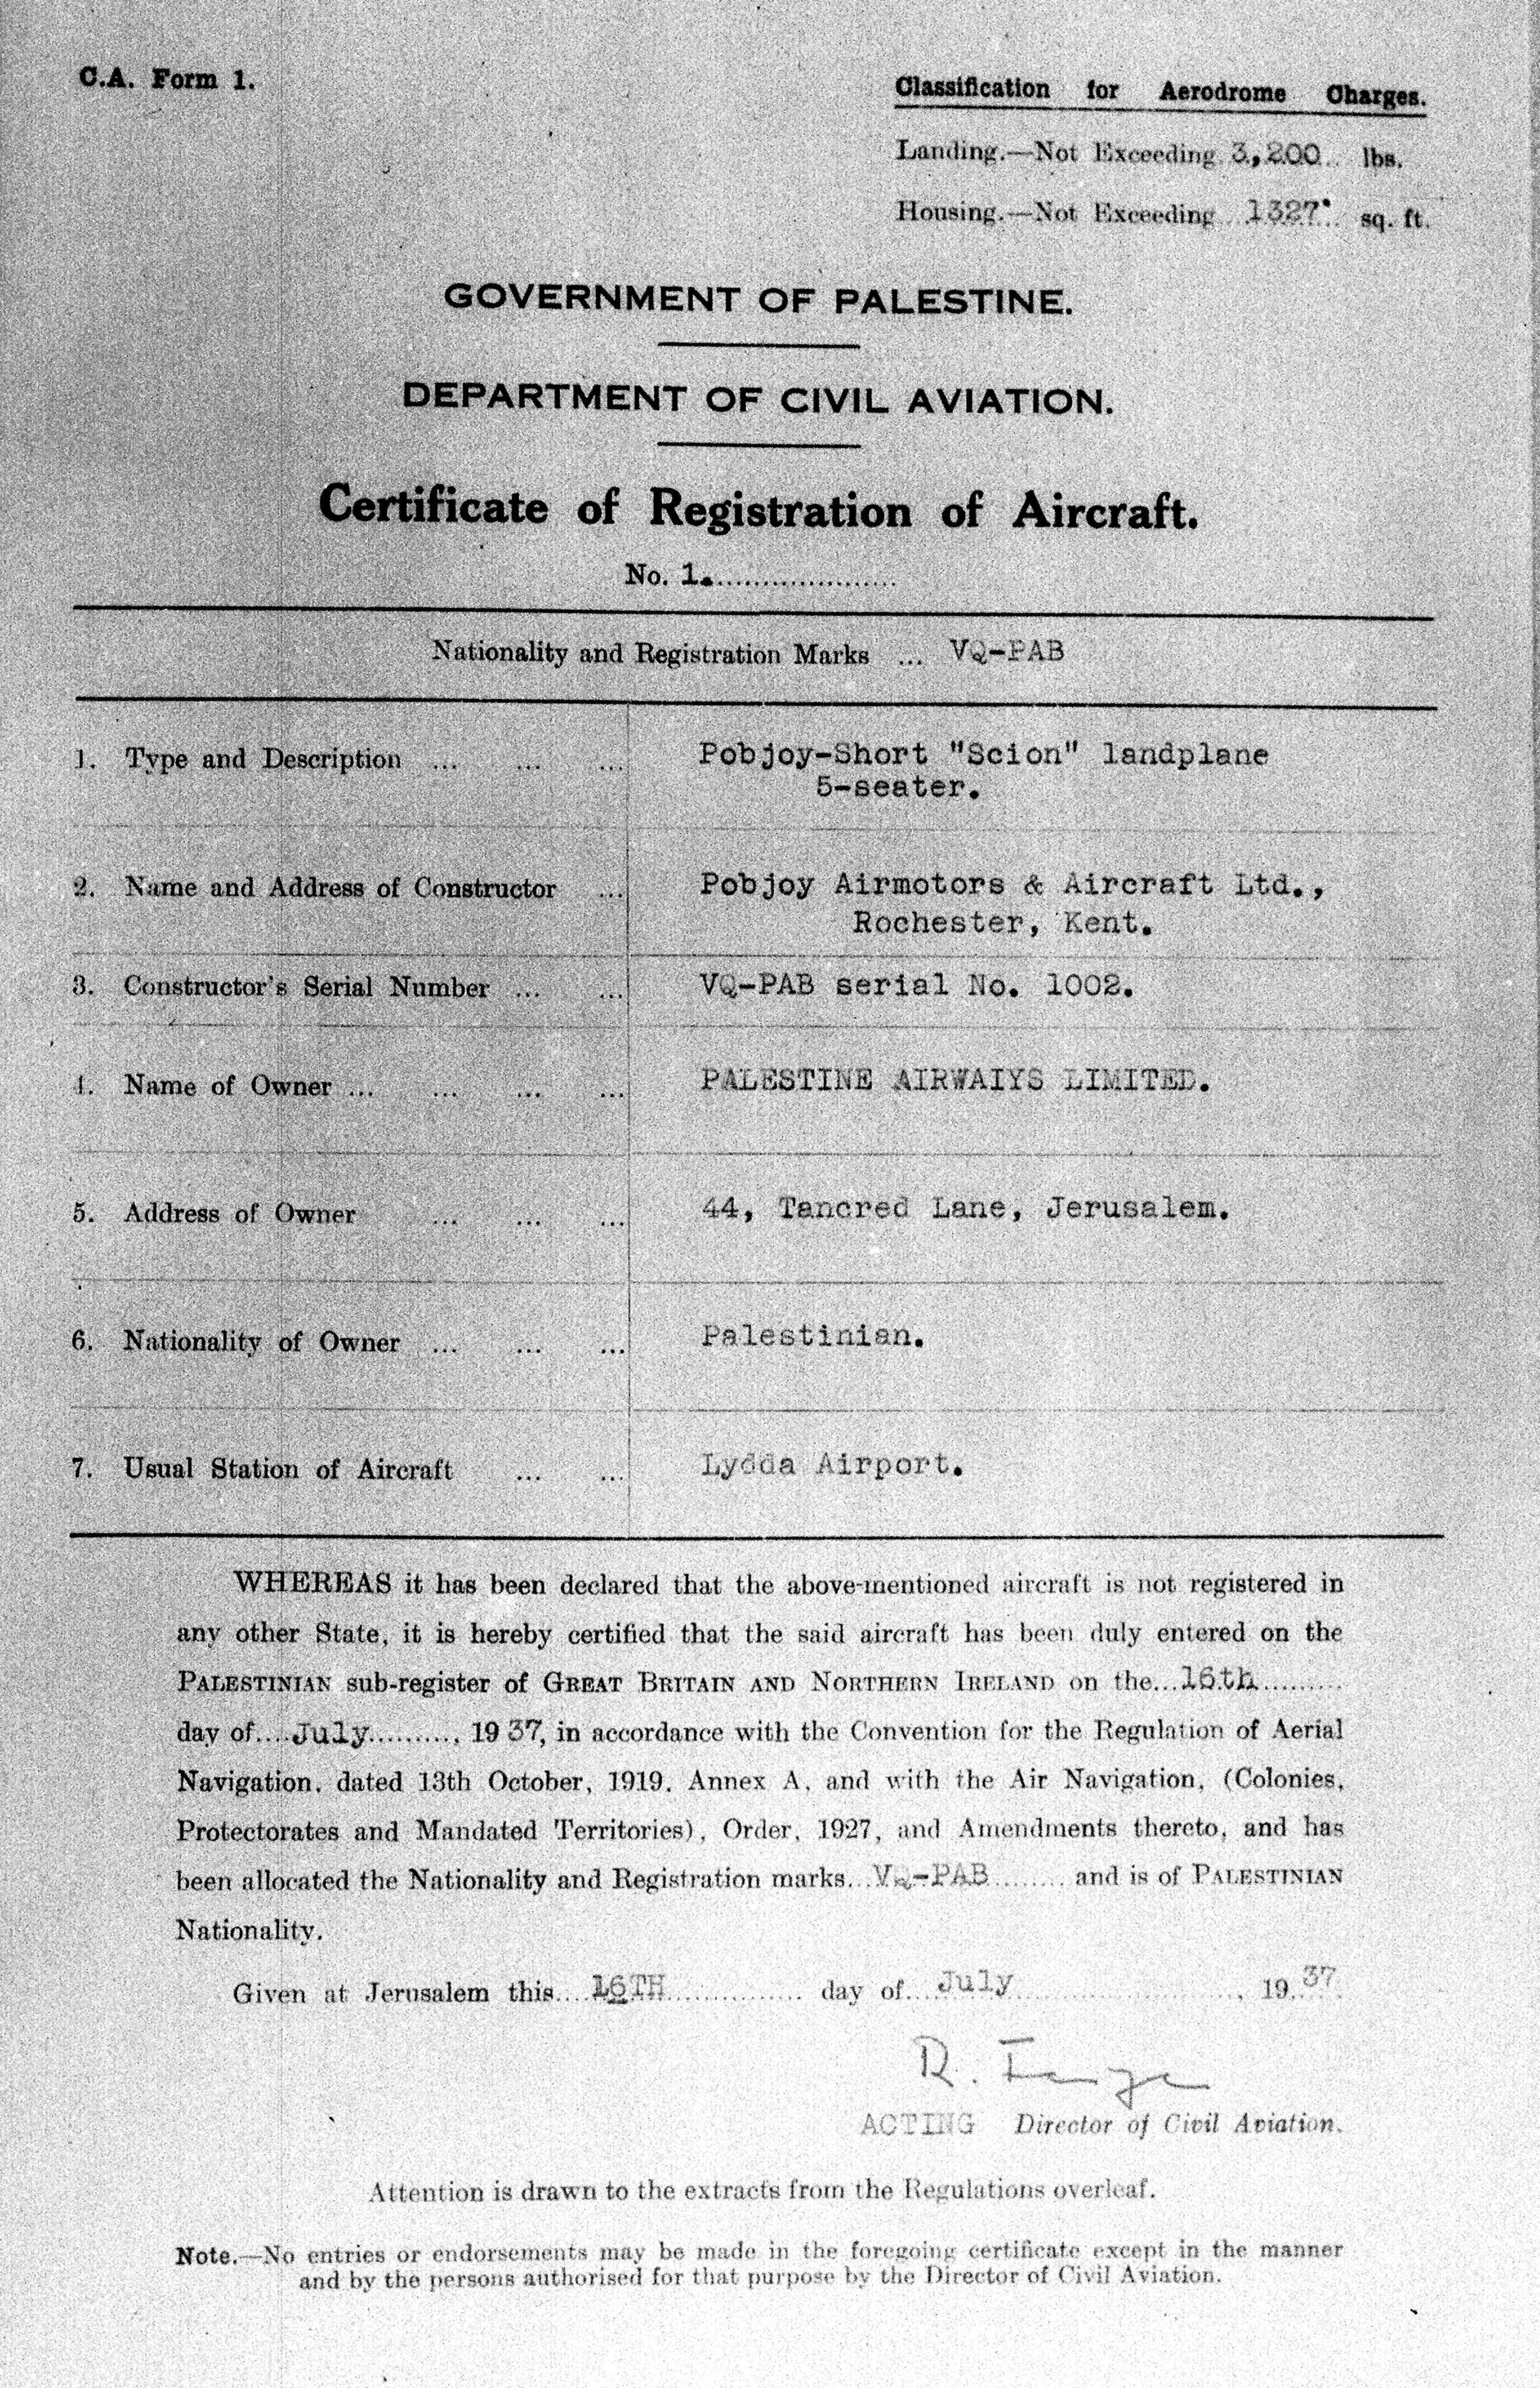 Fileregistration Certificate Of A Pobjoy Short Scionland Plane Of